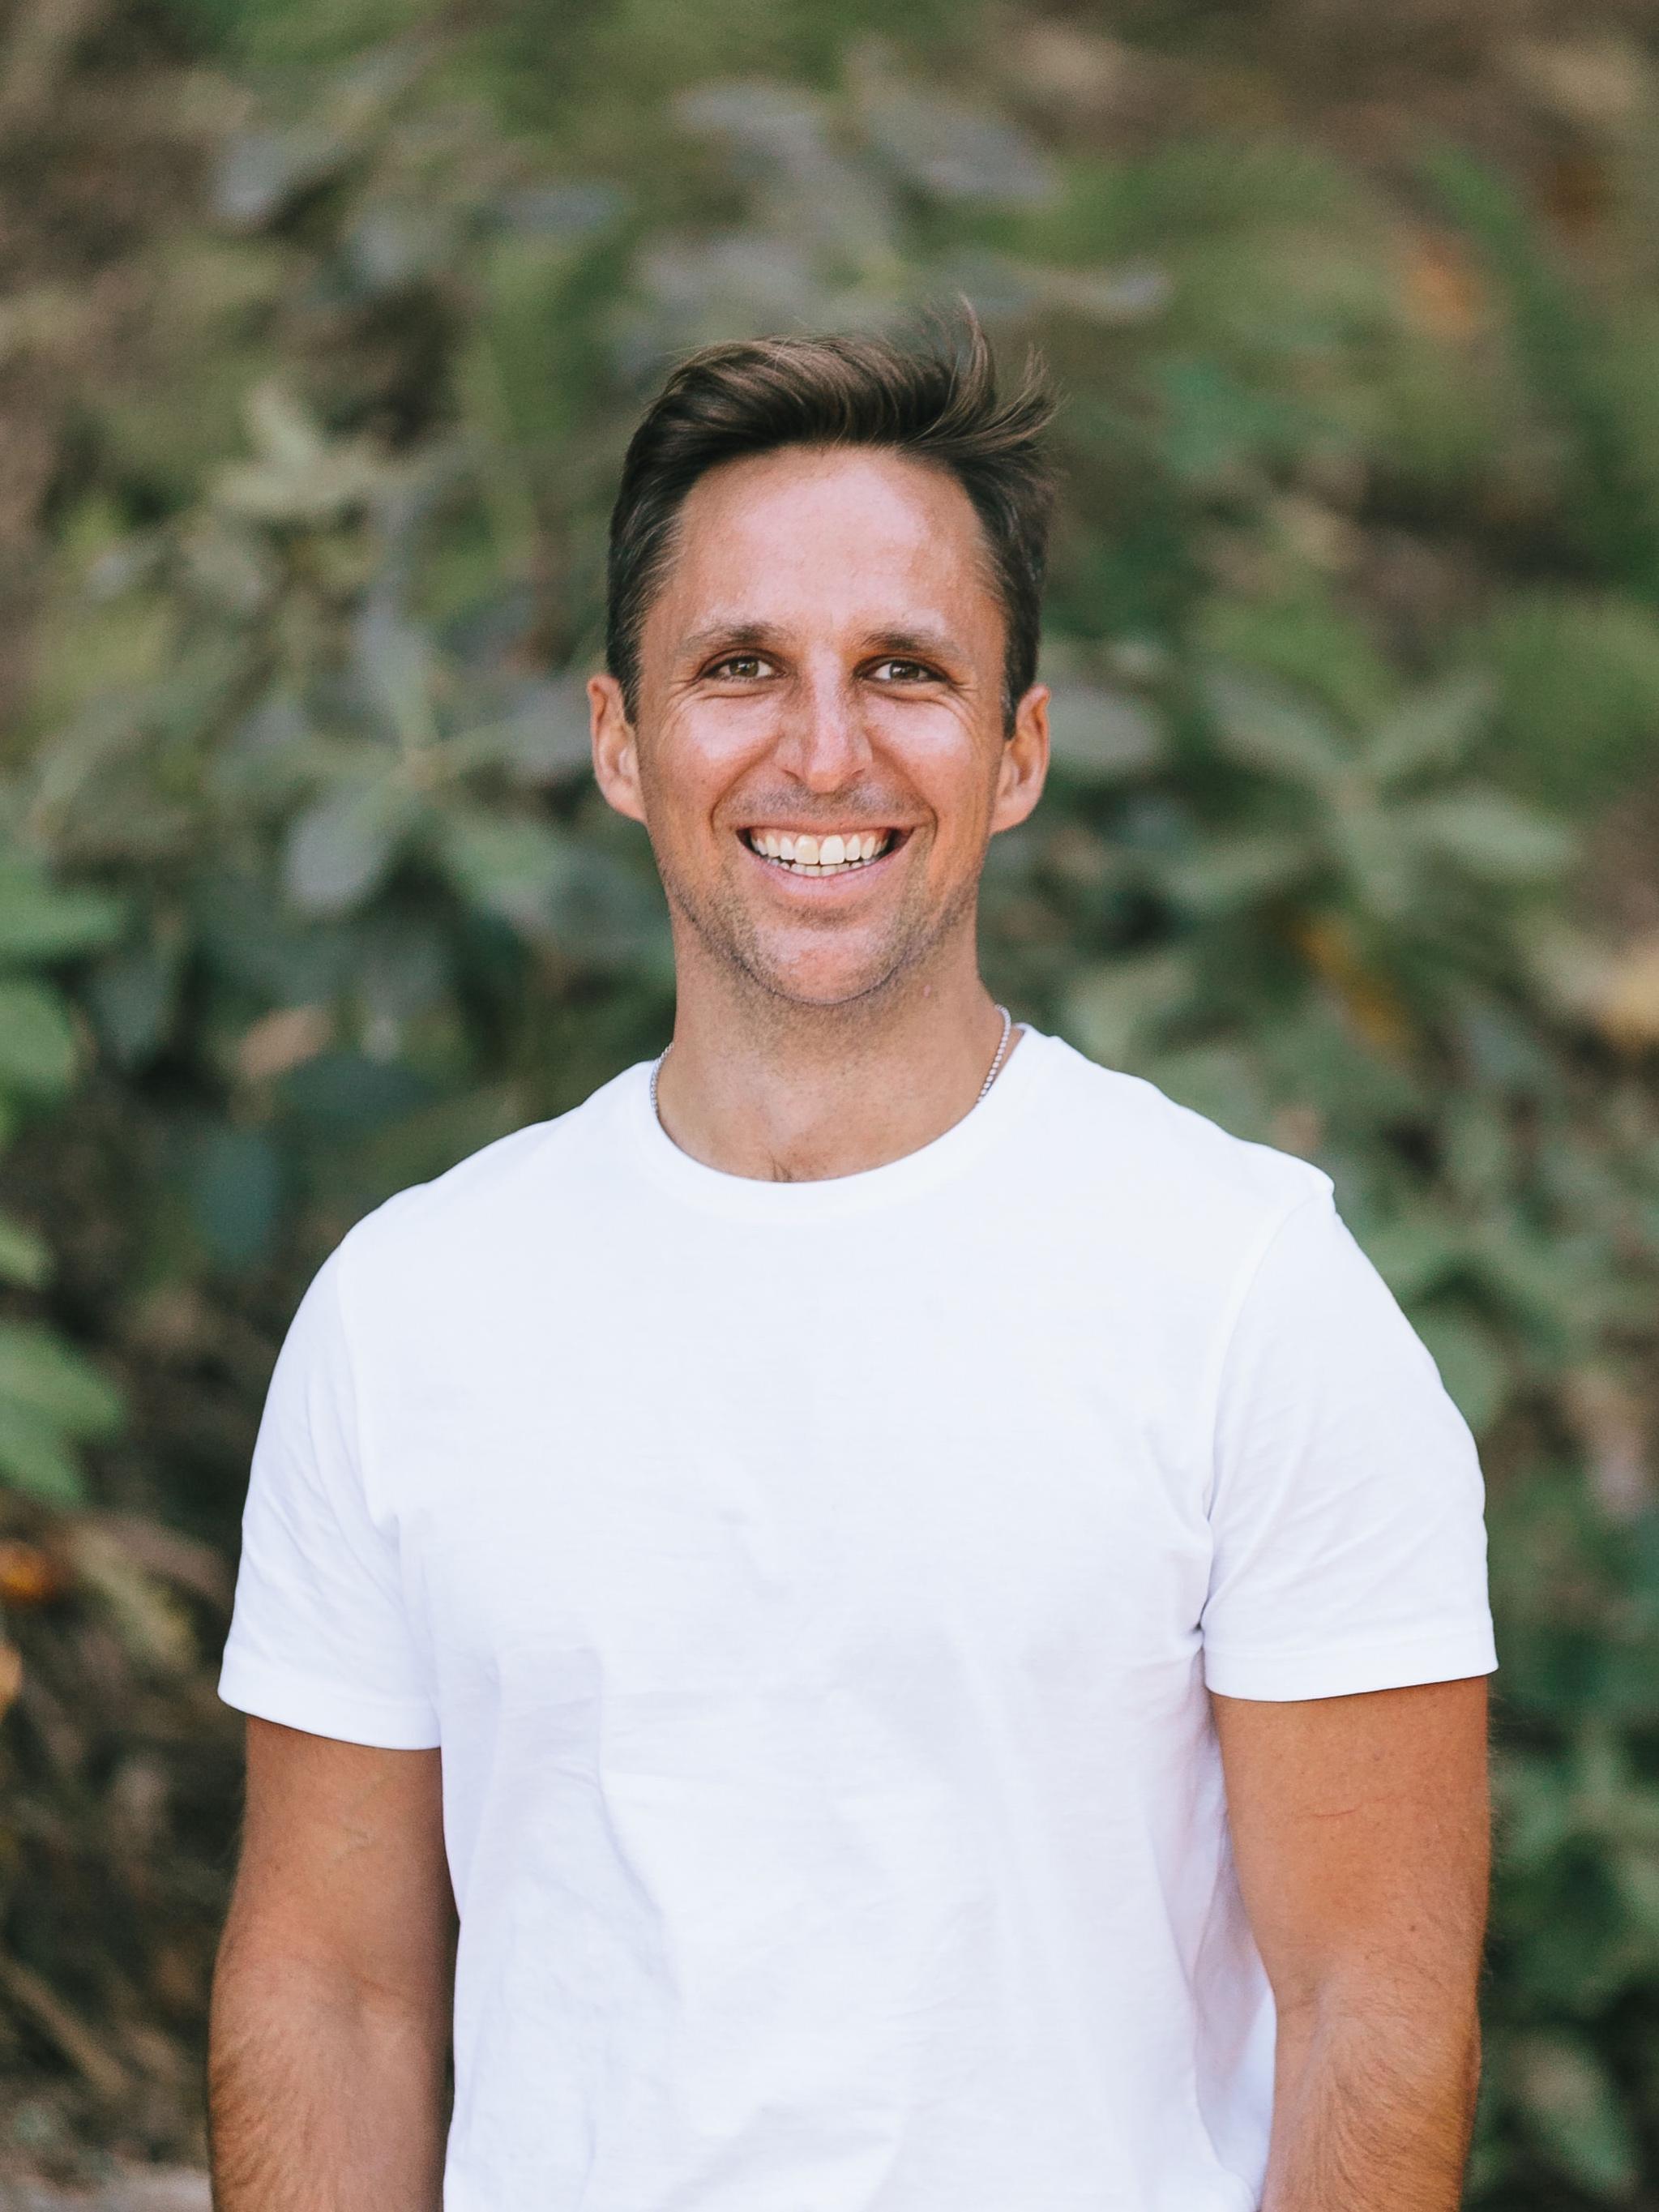 Joe DiStefano, Founder